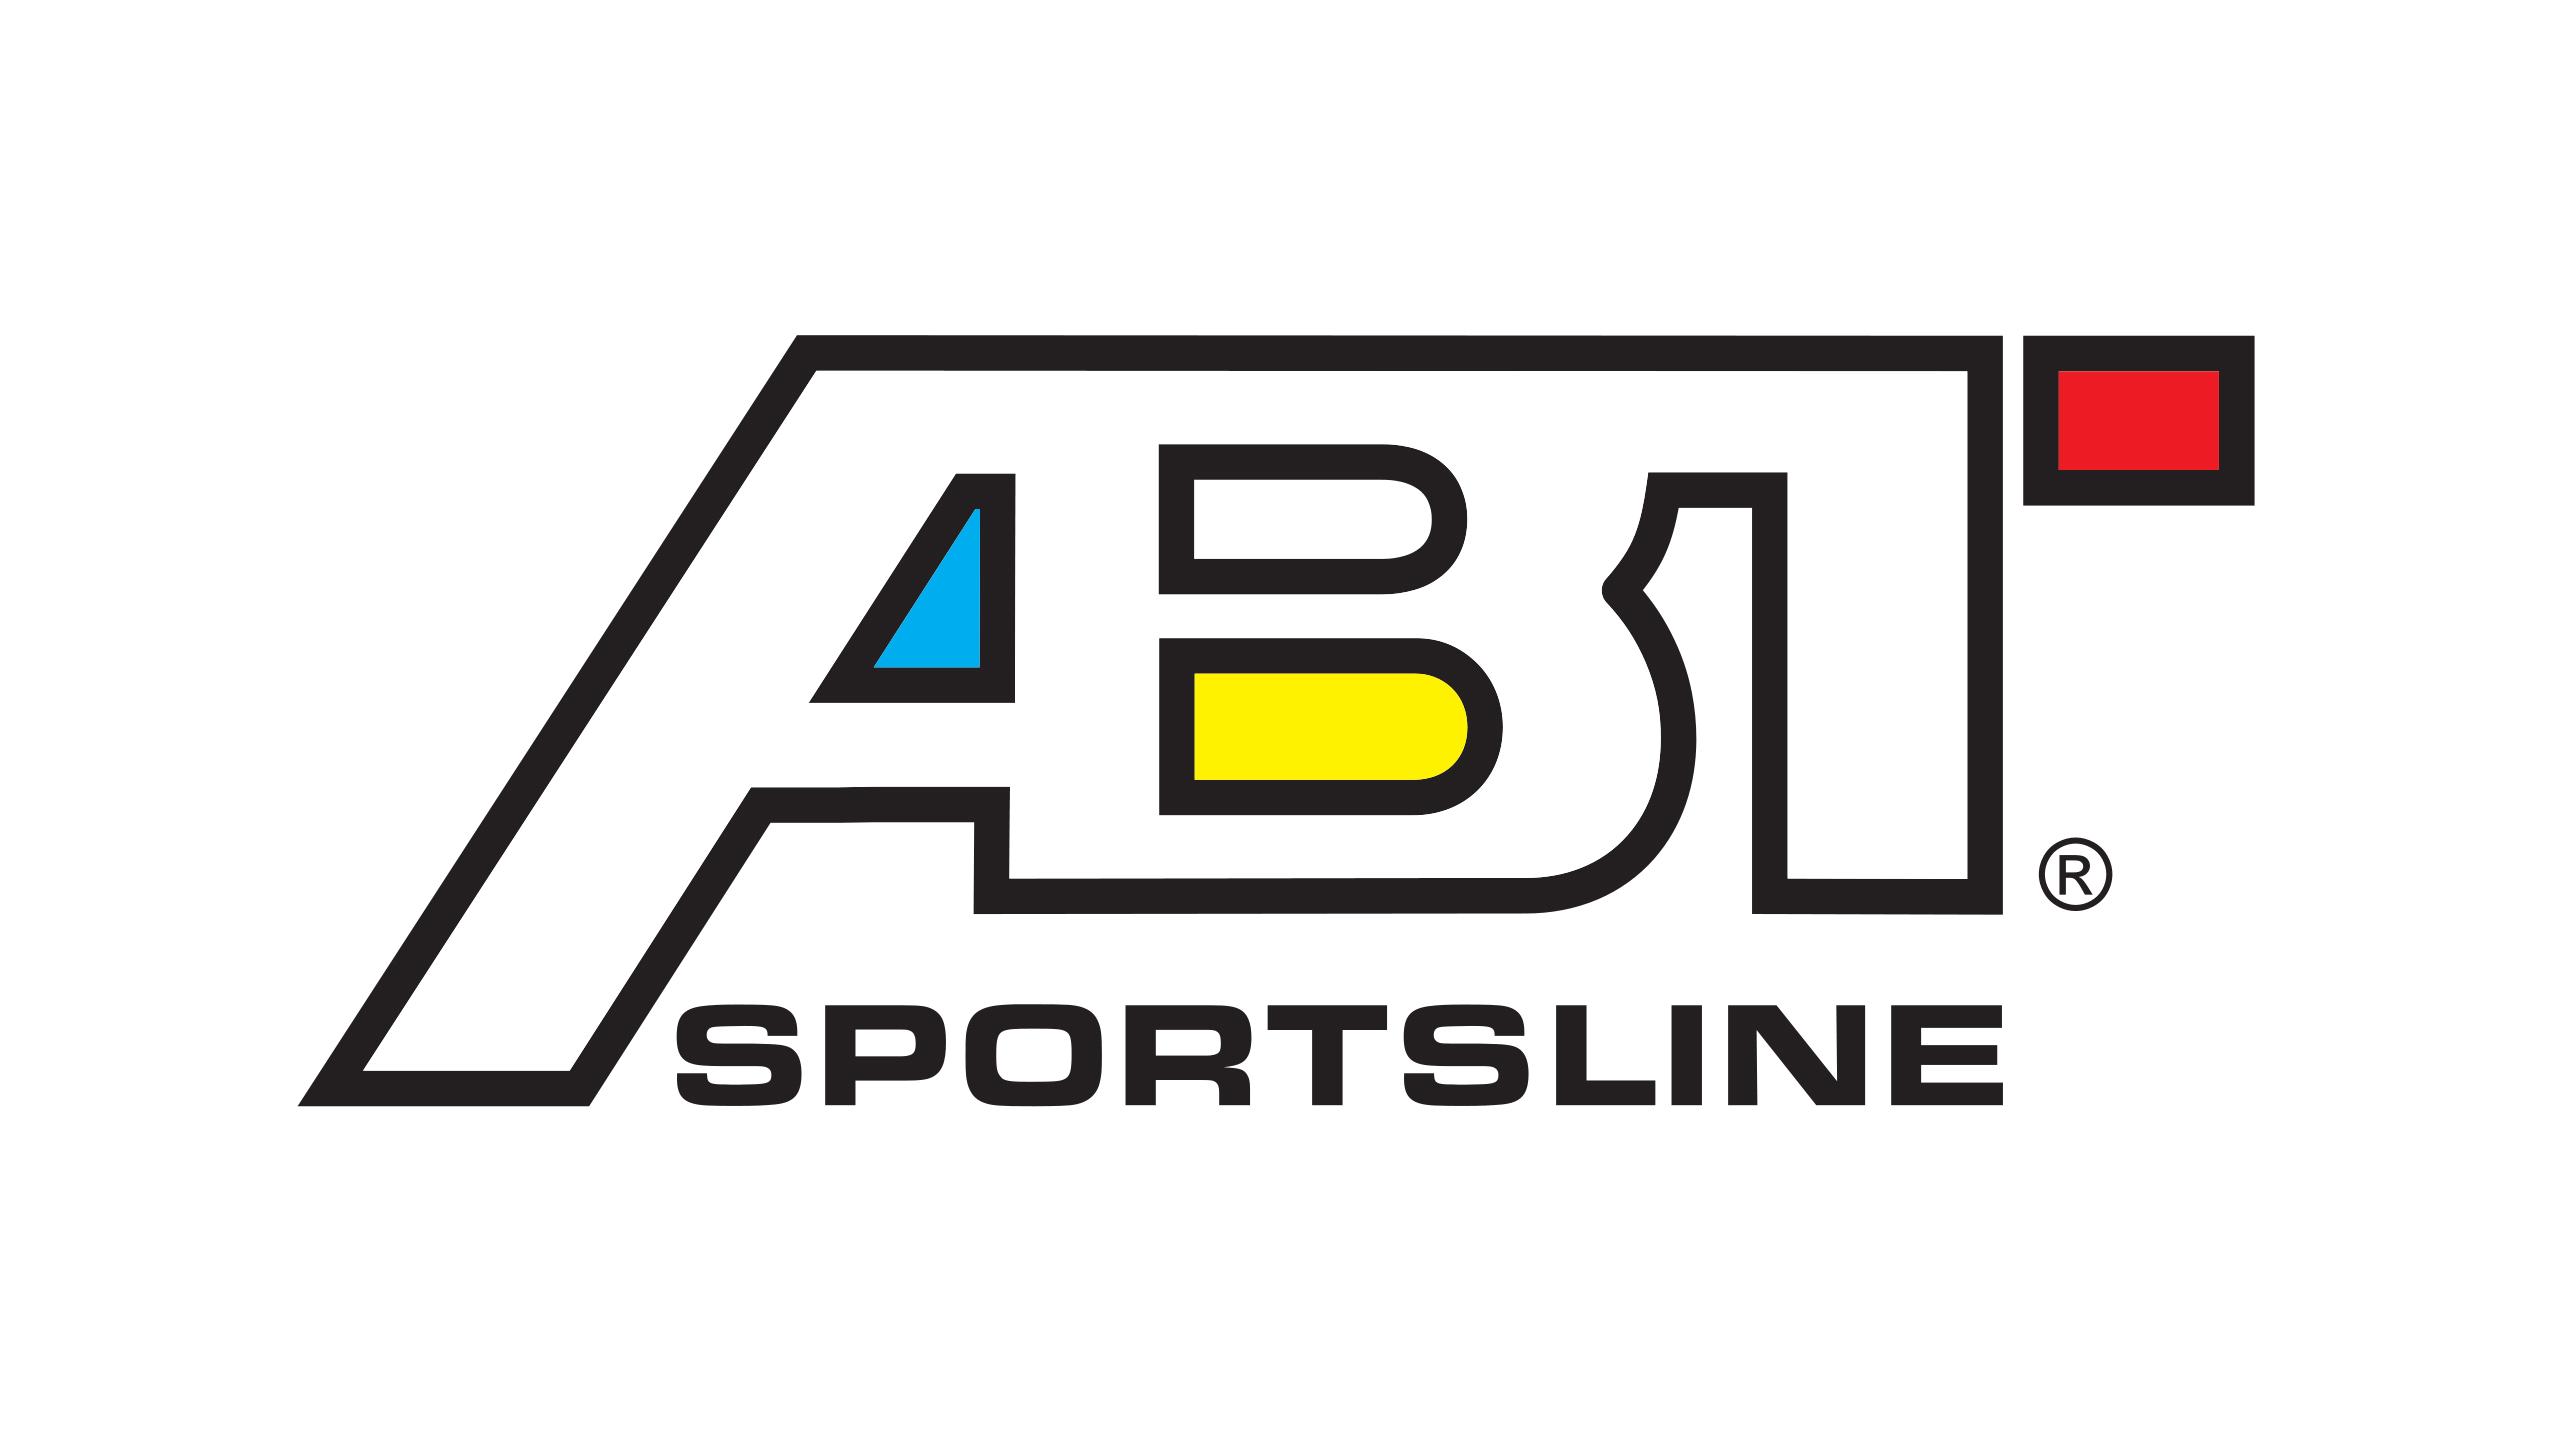 abt sportsline information carlogos daniel private logos